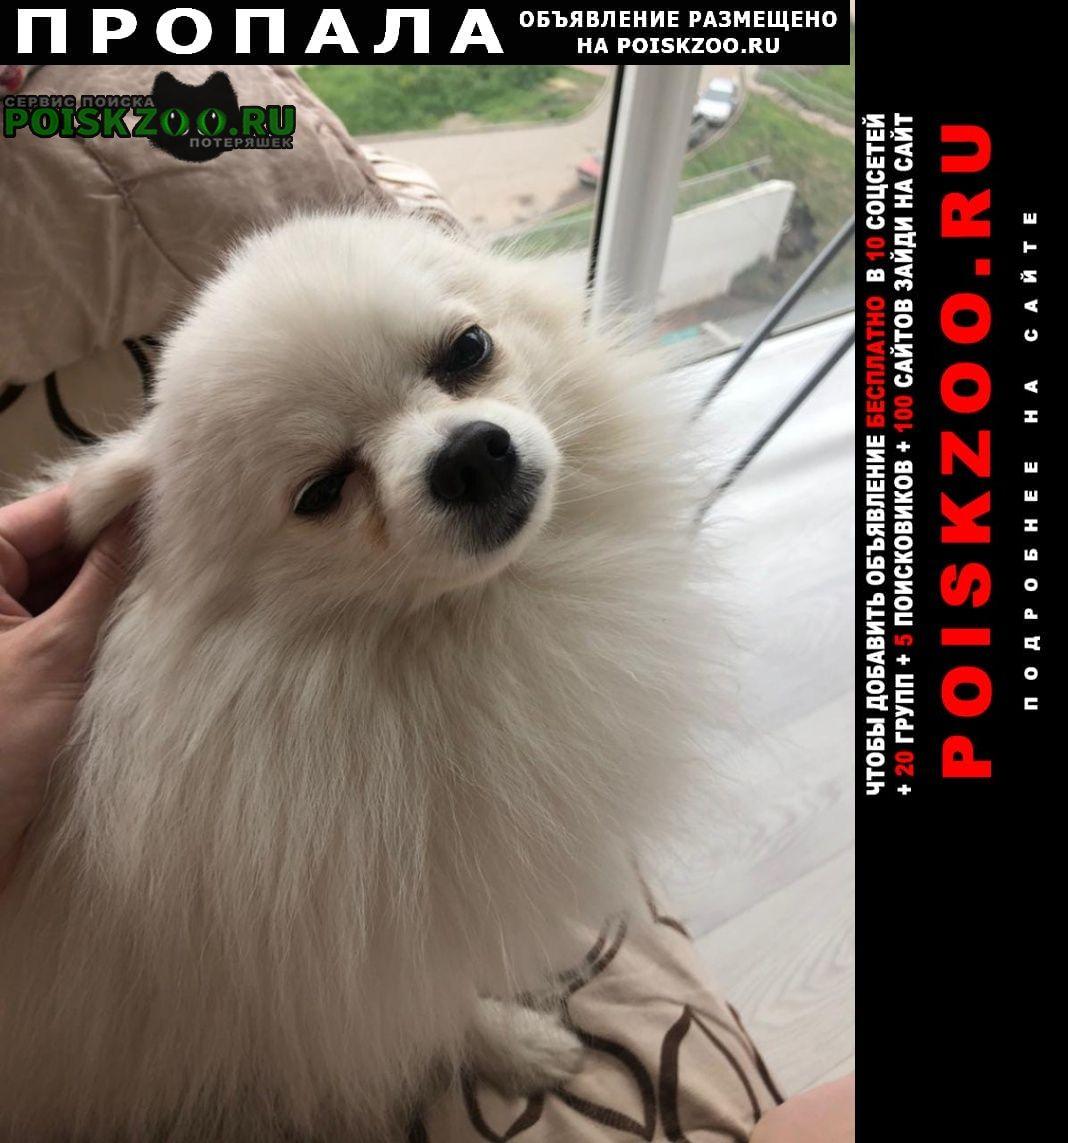 Пропала собака кобель шпиц Красноярск